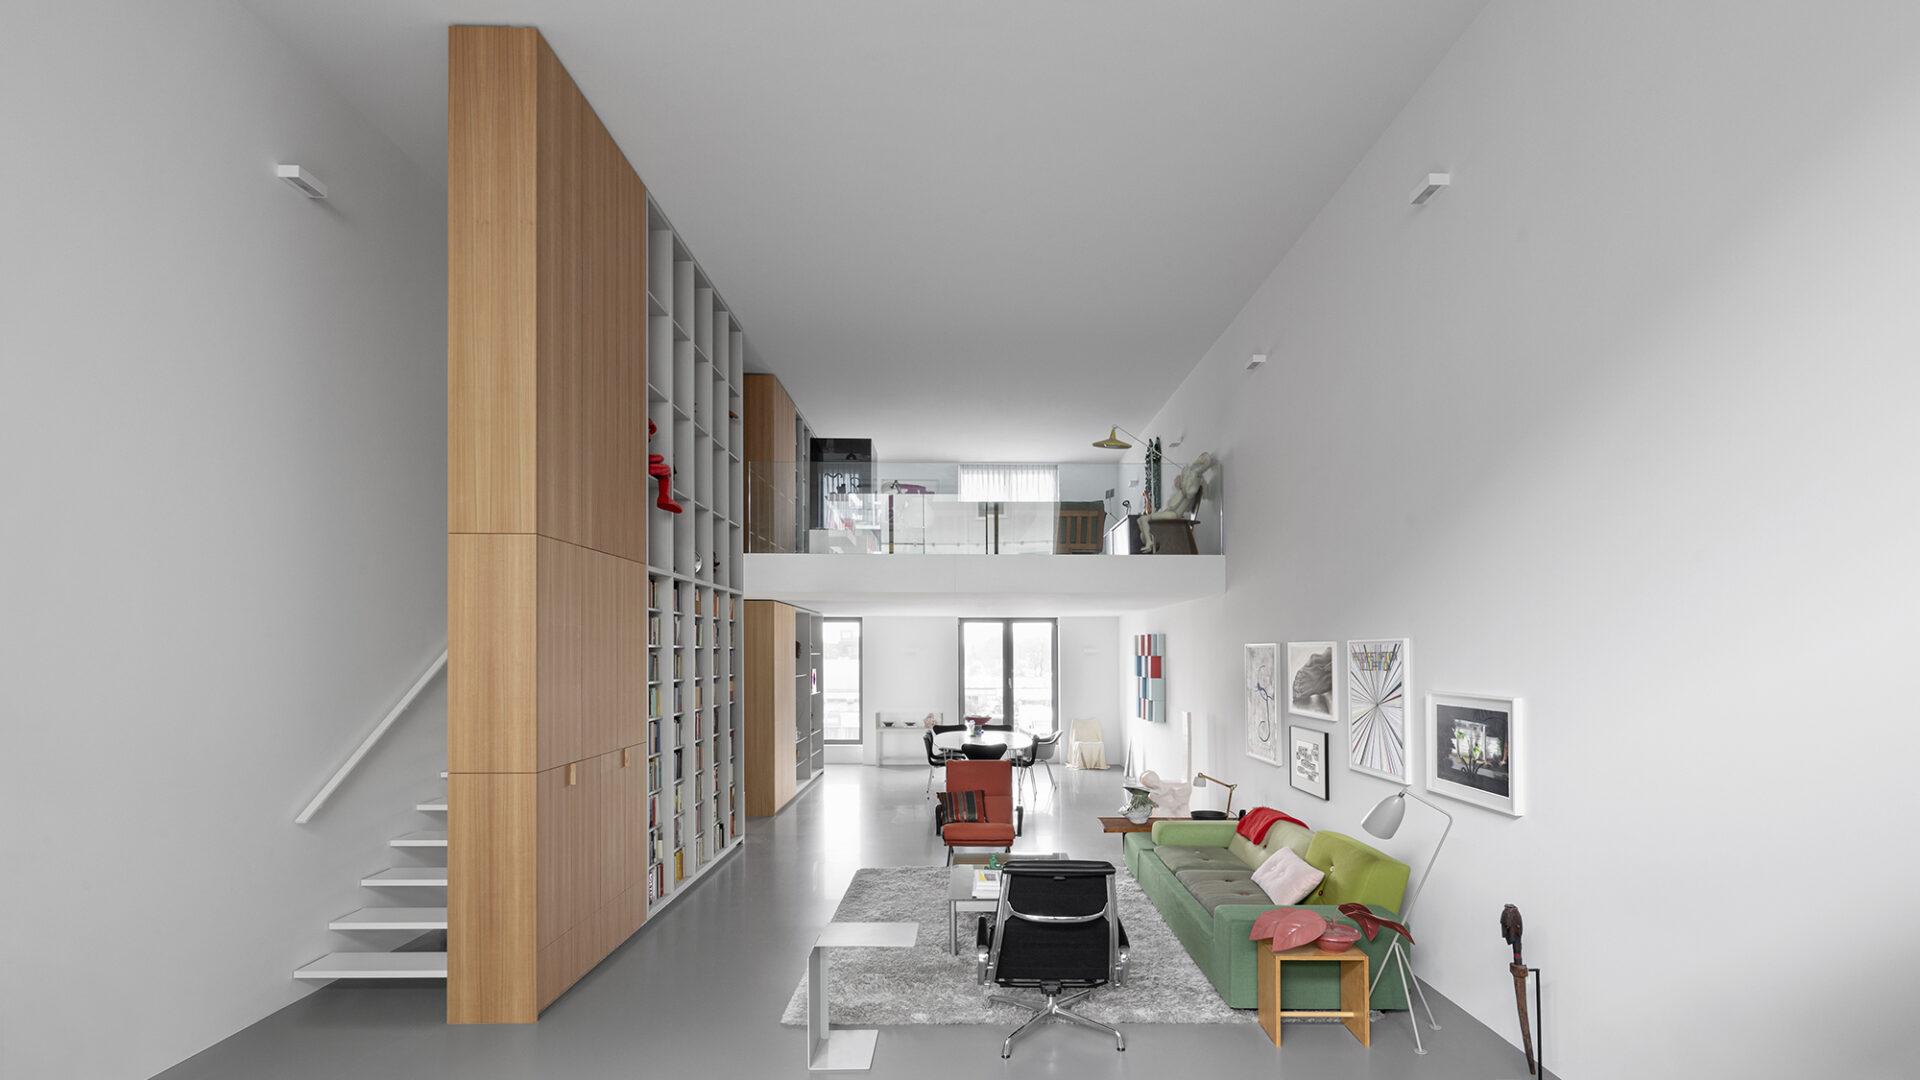 Loft pary pisarzy.  Pełen ikon designu, sztuki i książek